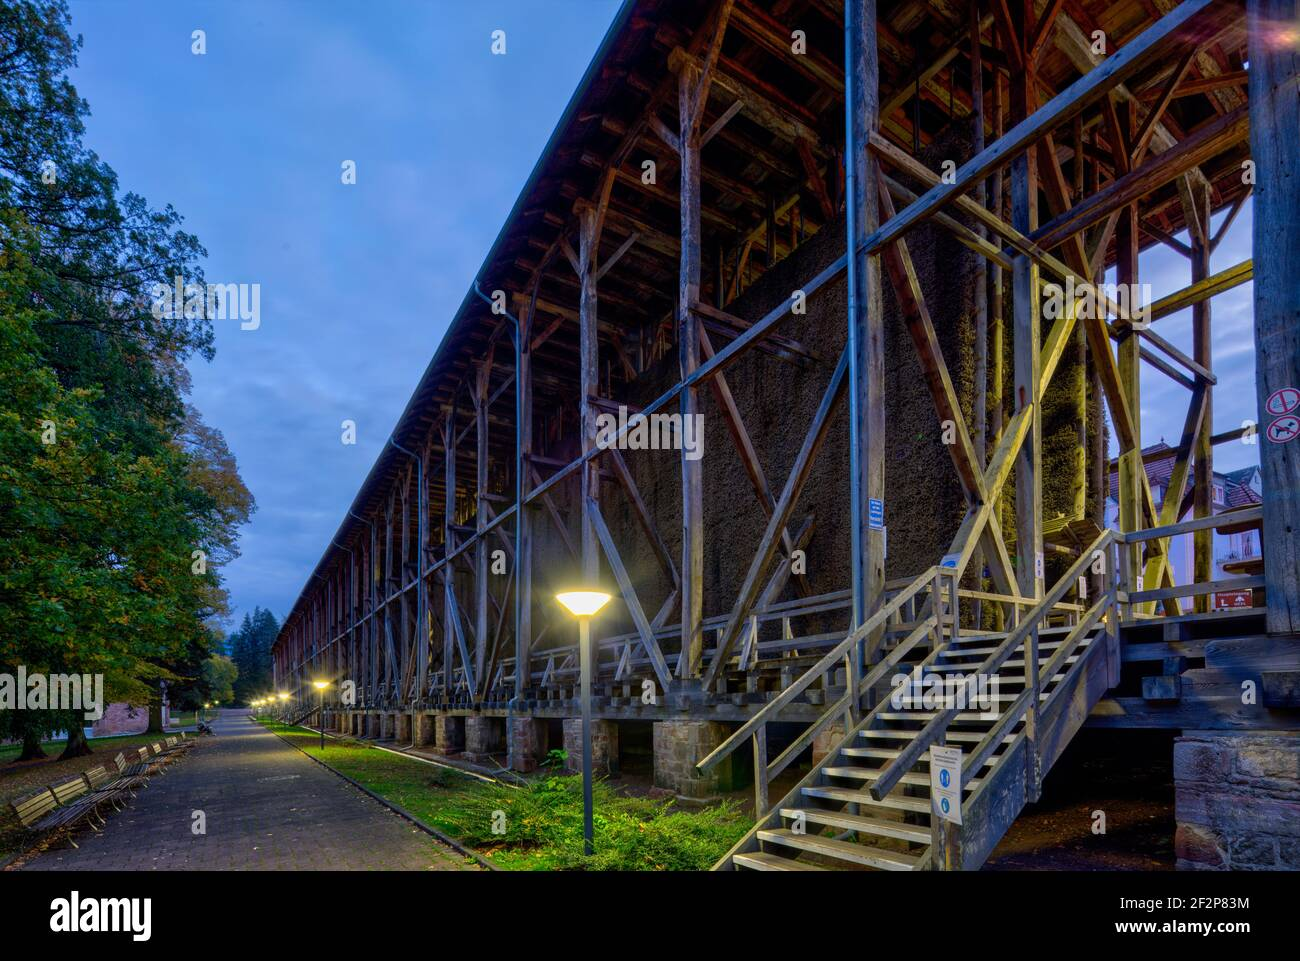 Spa gardens, graduation tower, blue hour, park, green area, Bad Orb, Main-Kinzig-Kreis, Hessen, Germany, Europe Stock Photo